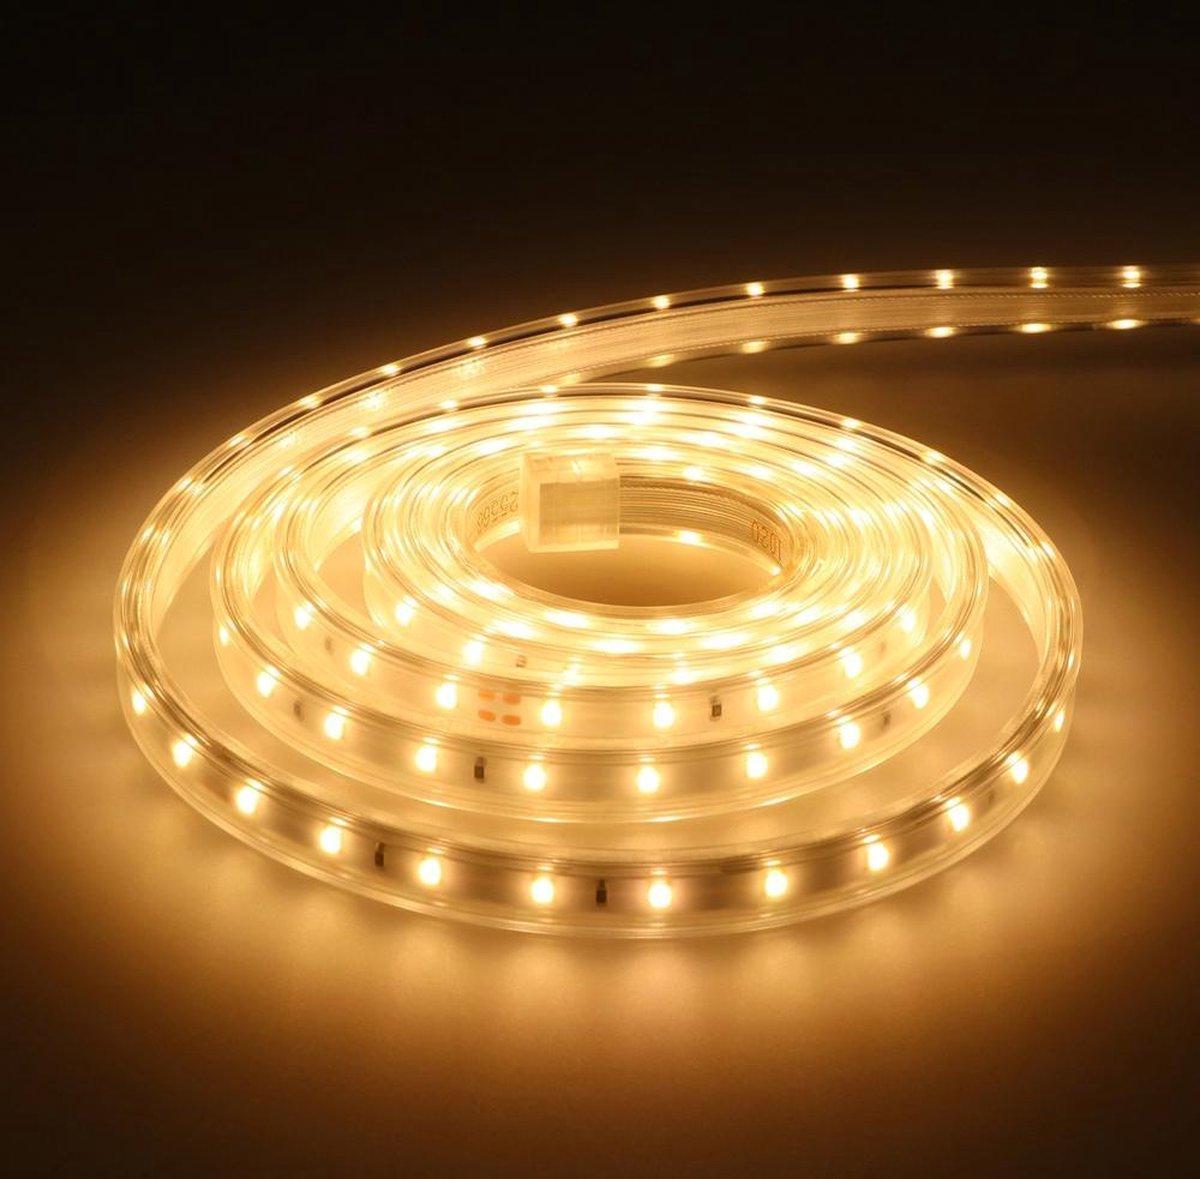 Dimbare LED Strip 2m 3000K 60 LEDs/m IP65 Plug & Play - Flex60 Series